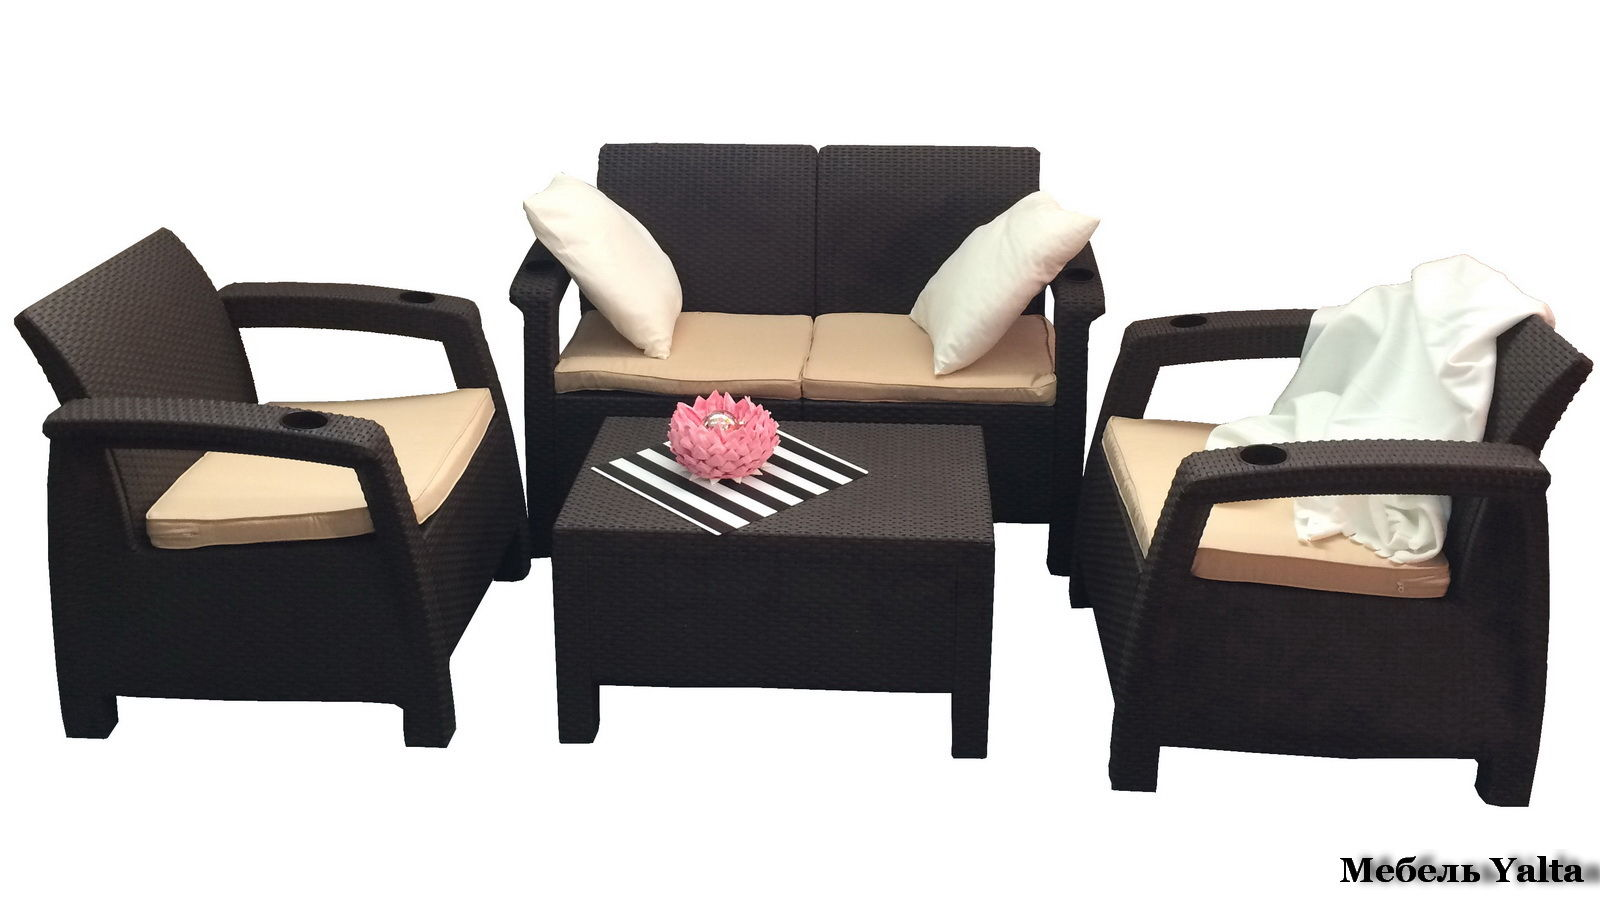 "Комплект мебели ""yalta set"" - арива мебель екатеринбург."